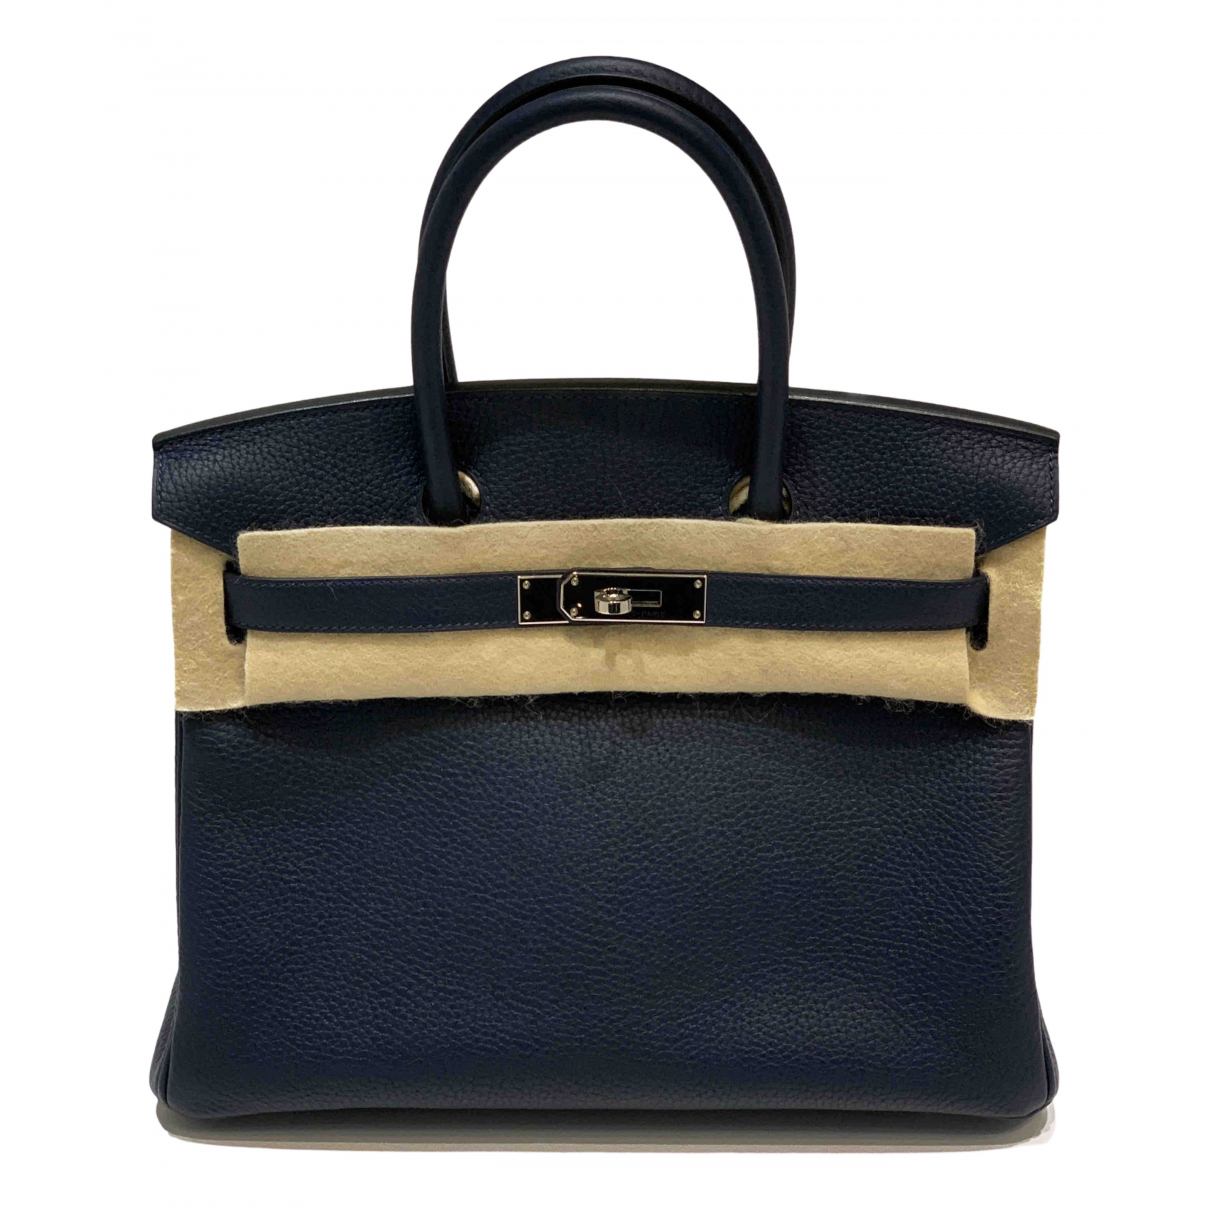 Hermes Birkin 30 Handtasche in  Blau Leder